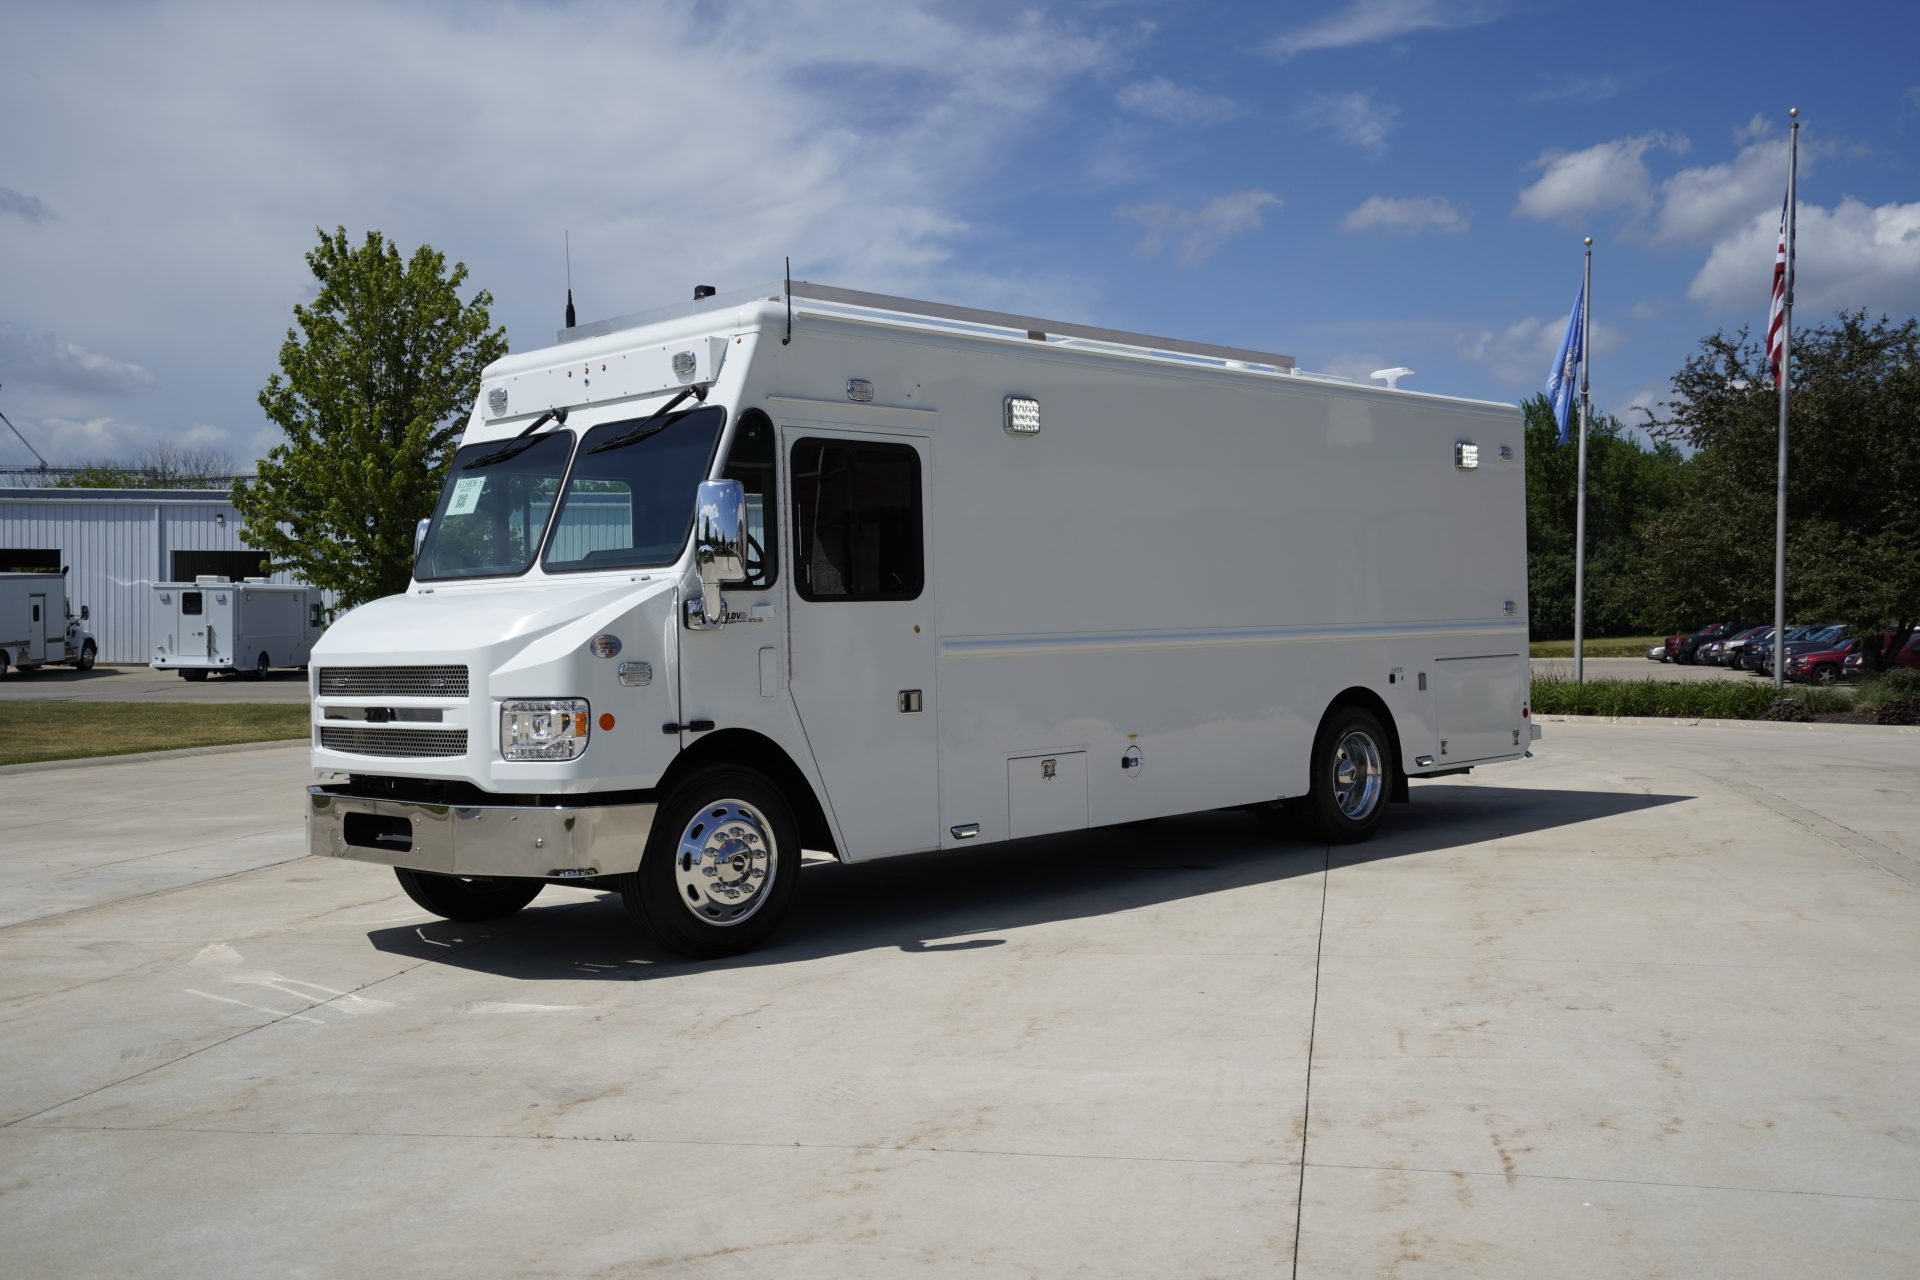 LDV-Oakland Police Department Mobile Command Center